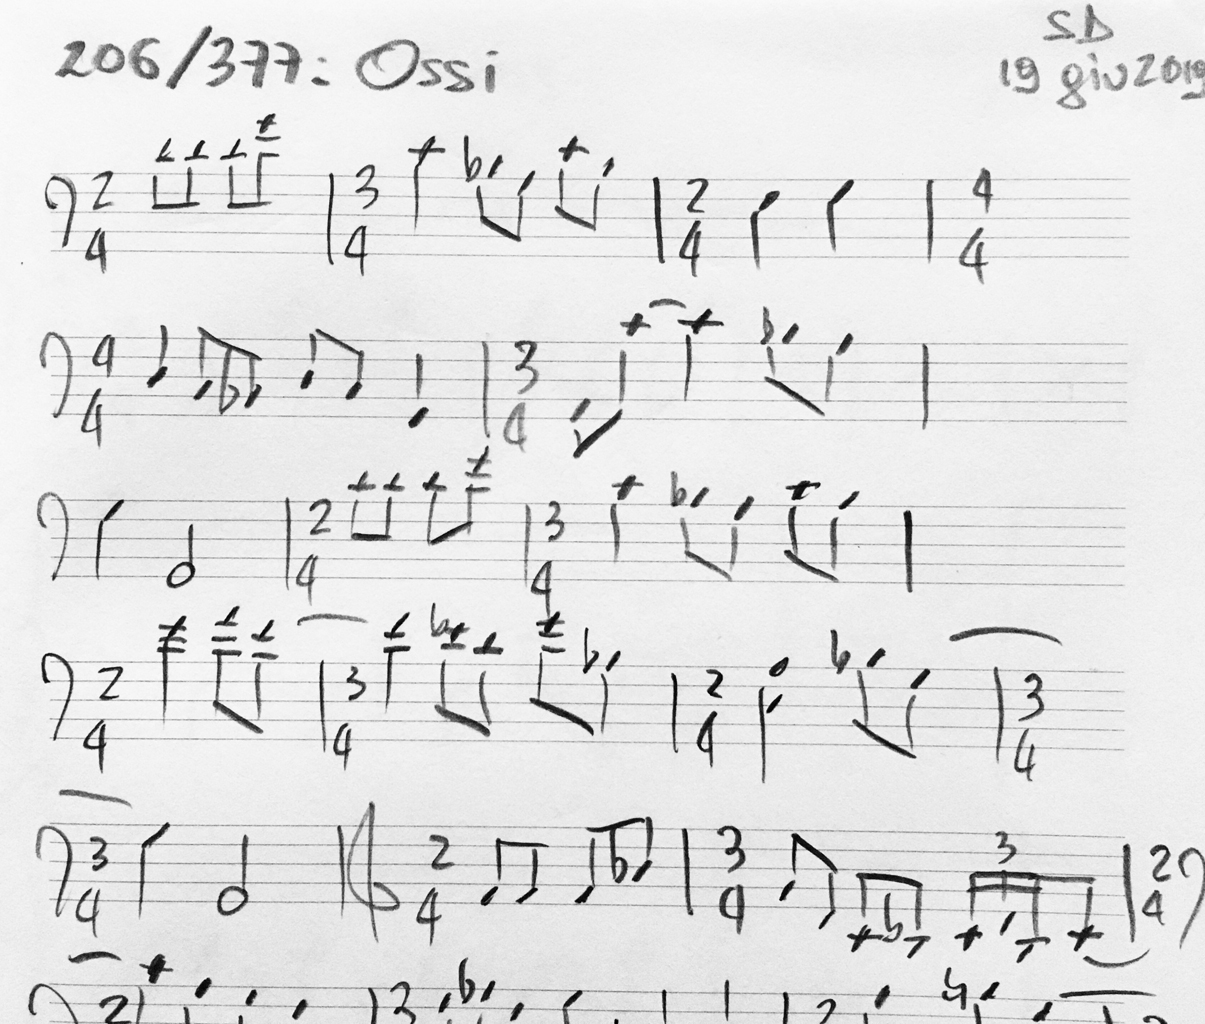 206-Ossi-score